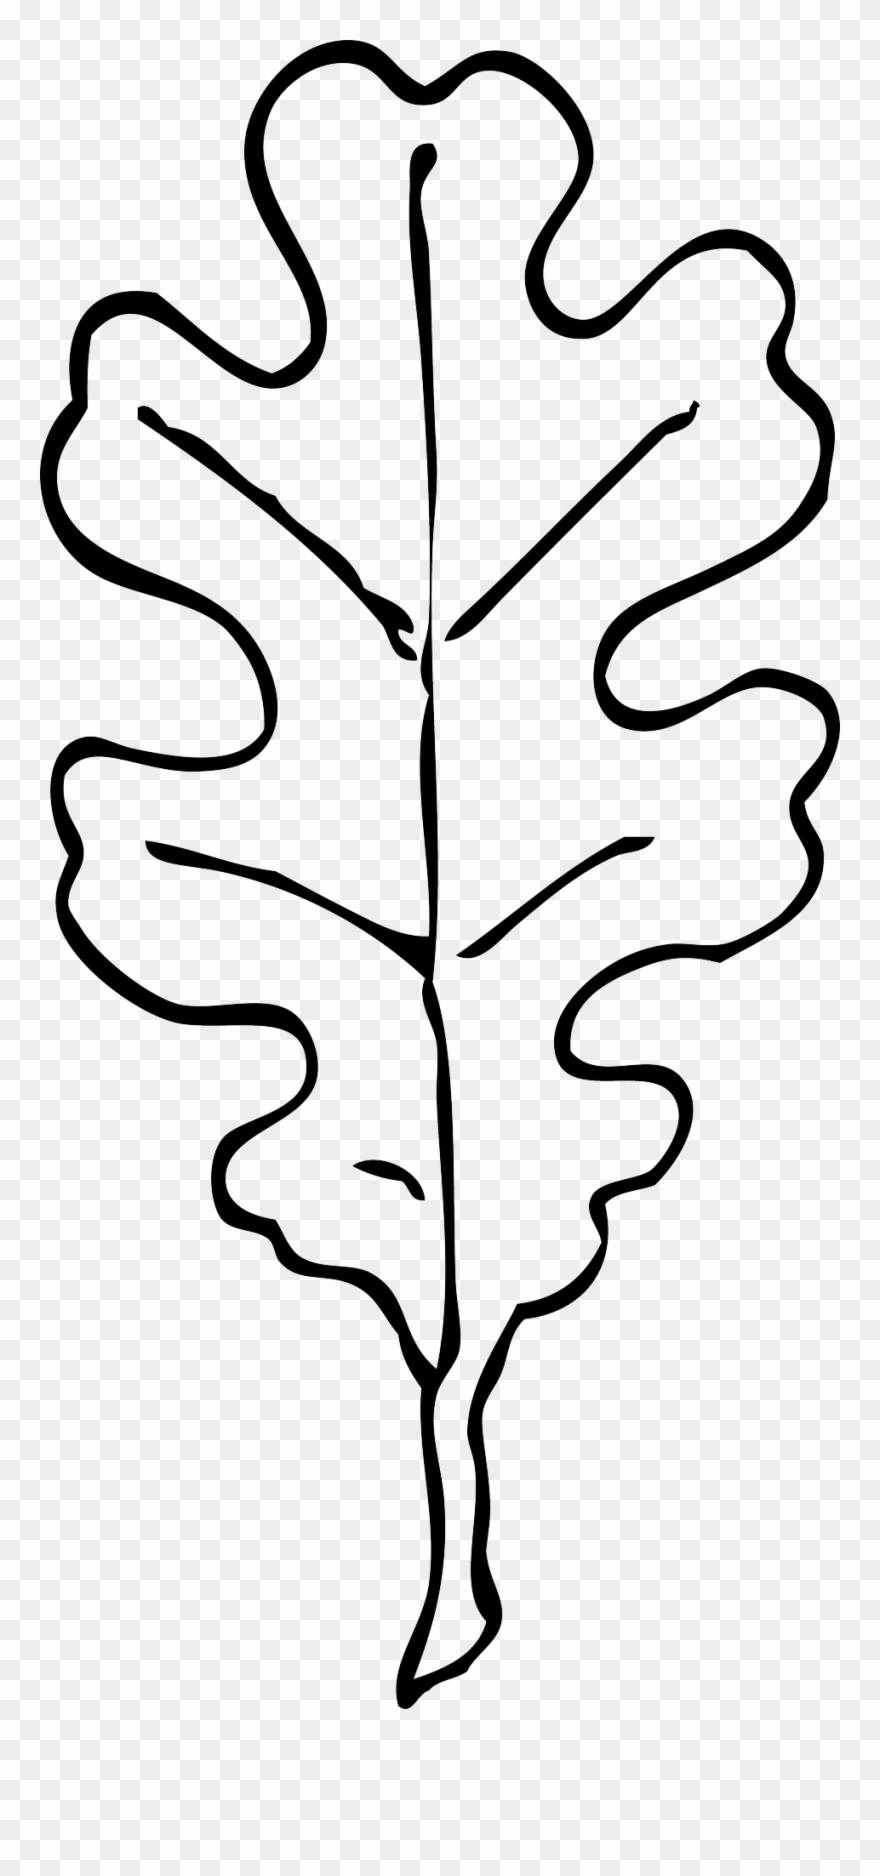 Oak Leaf Black White Line Art Clipart Panda Free Clipart.